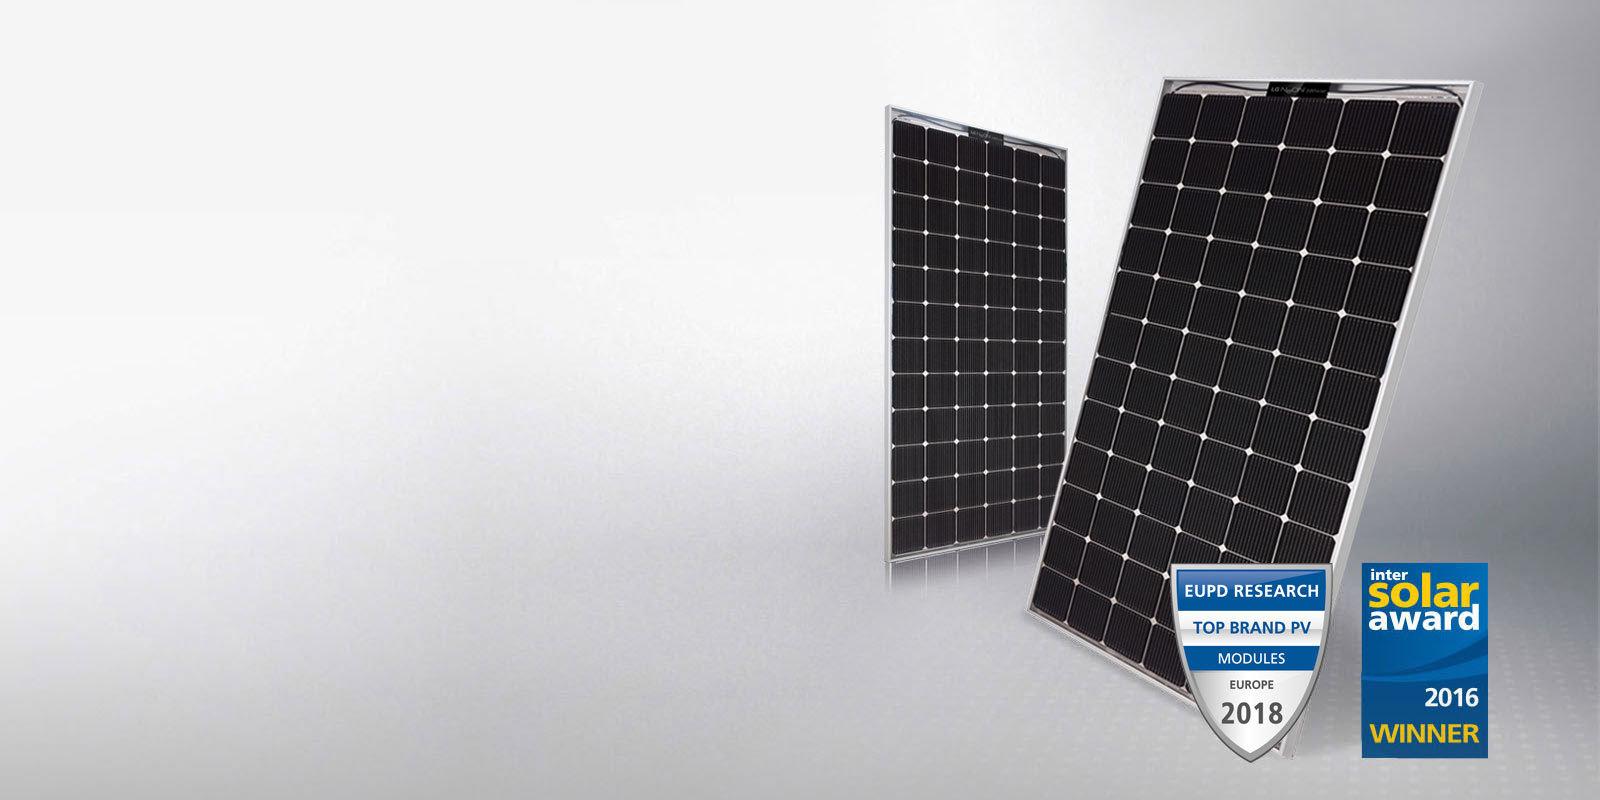 myCleantechSolarPower™ - LG Solarpannel NeON2 bifacial Typ (C) - Musterbild